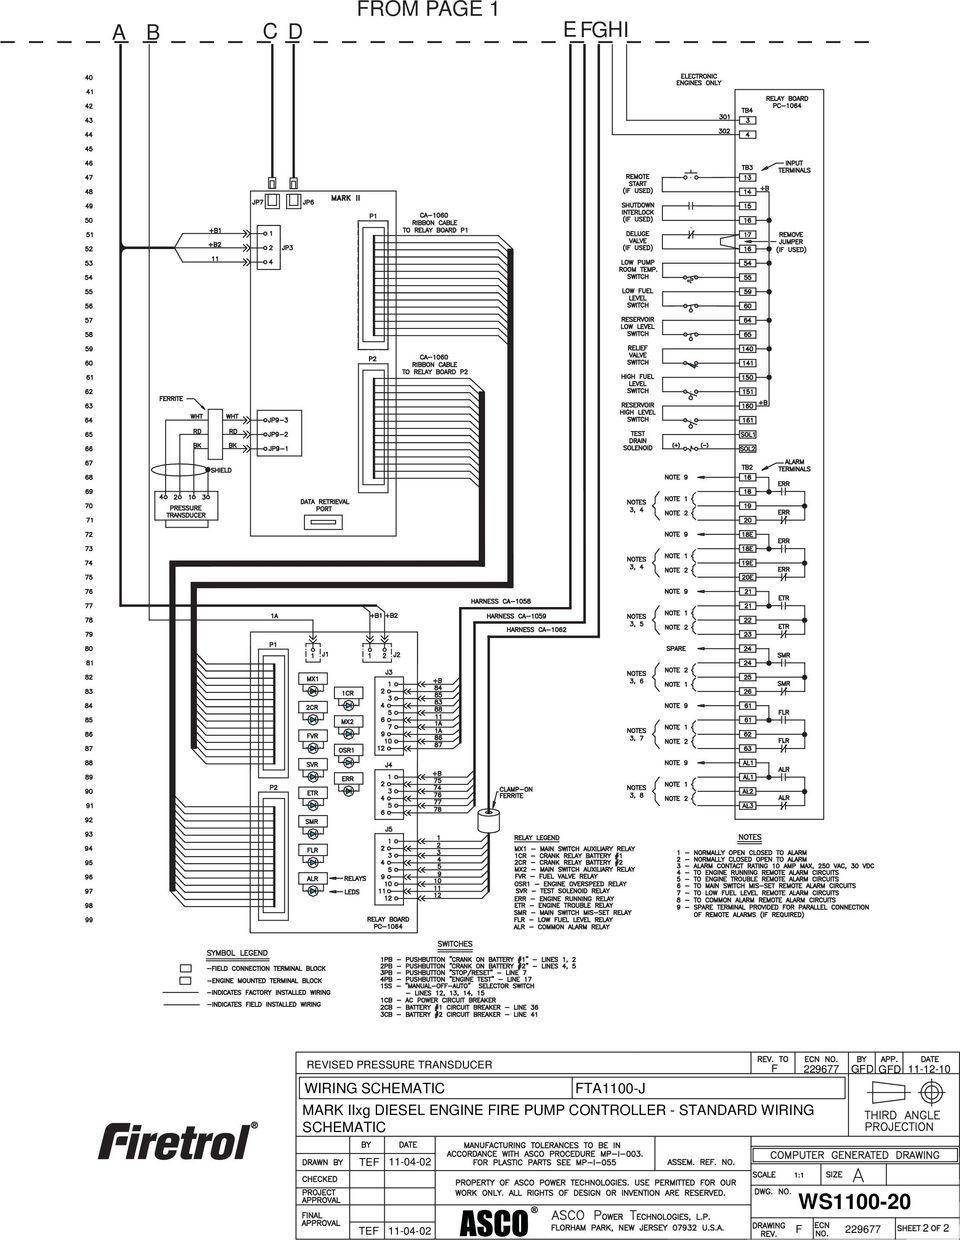 hight resolution of iixg diesel engine fire pump controller standard wiring